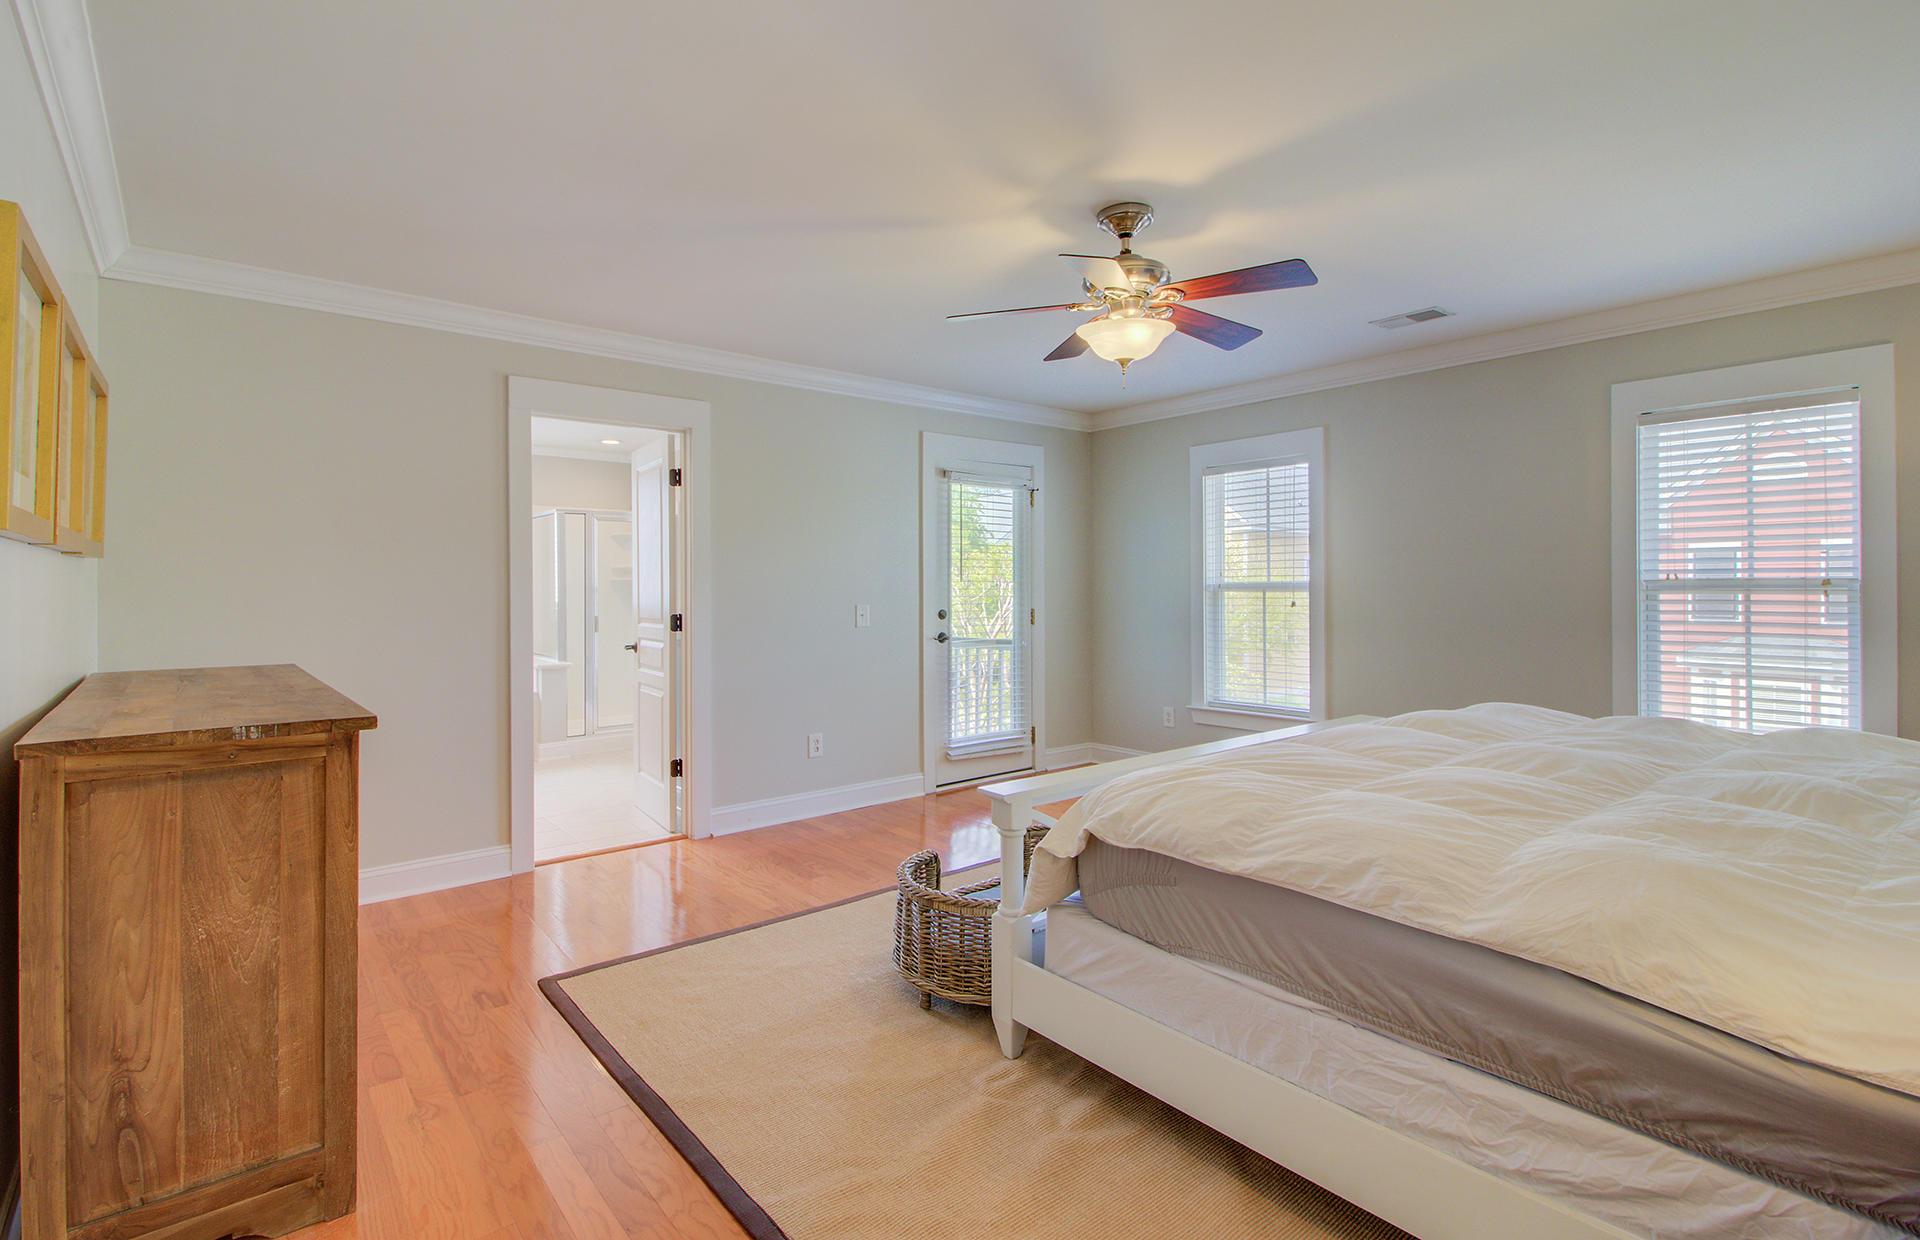 New Parrish Village Homes For Sale - 1109 Dawn View, Mount Pleasant, SC - 23